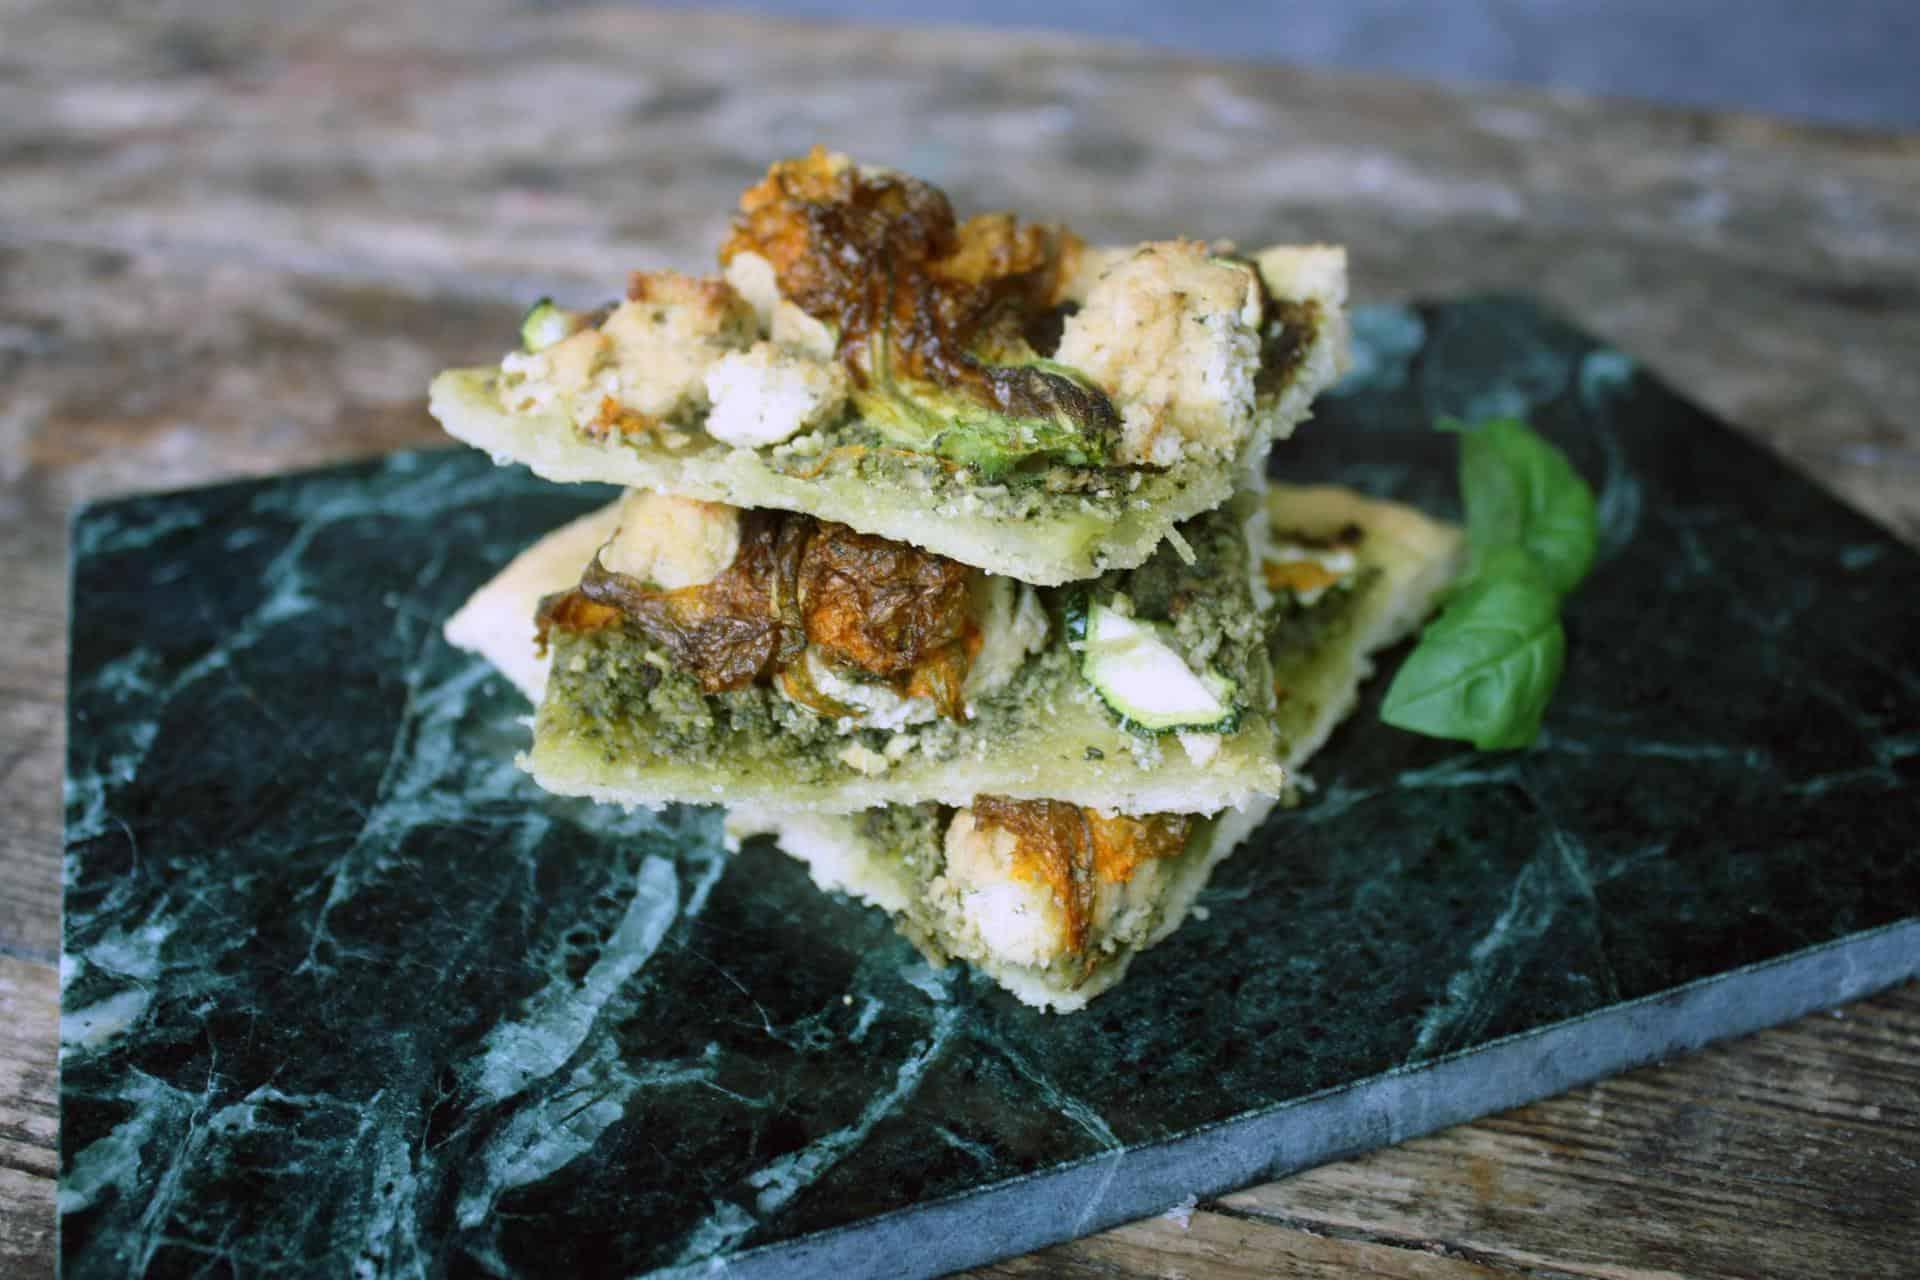 Pesto pizza with zucchini blossoms and cashew ricotta (vegan)